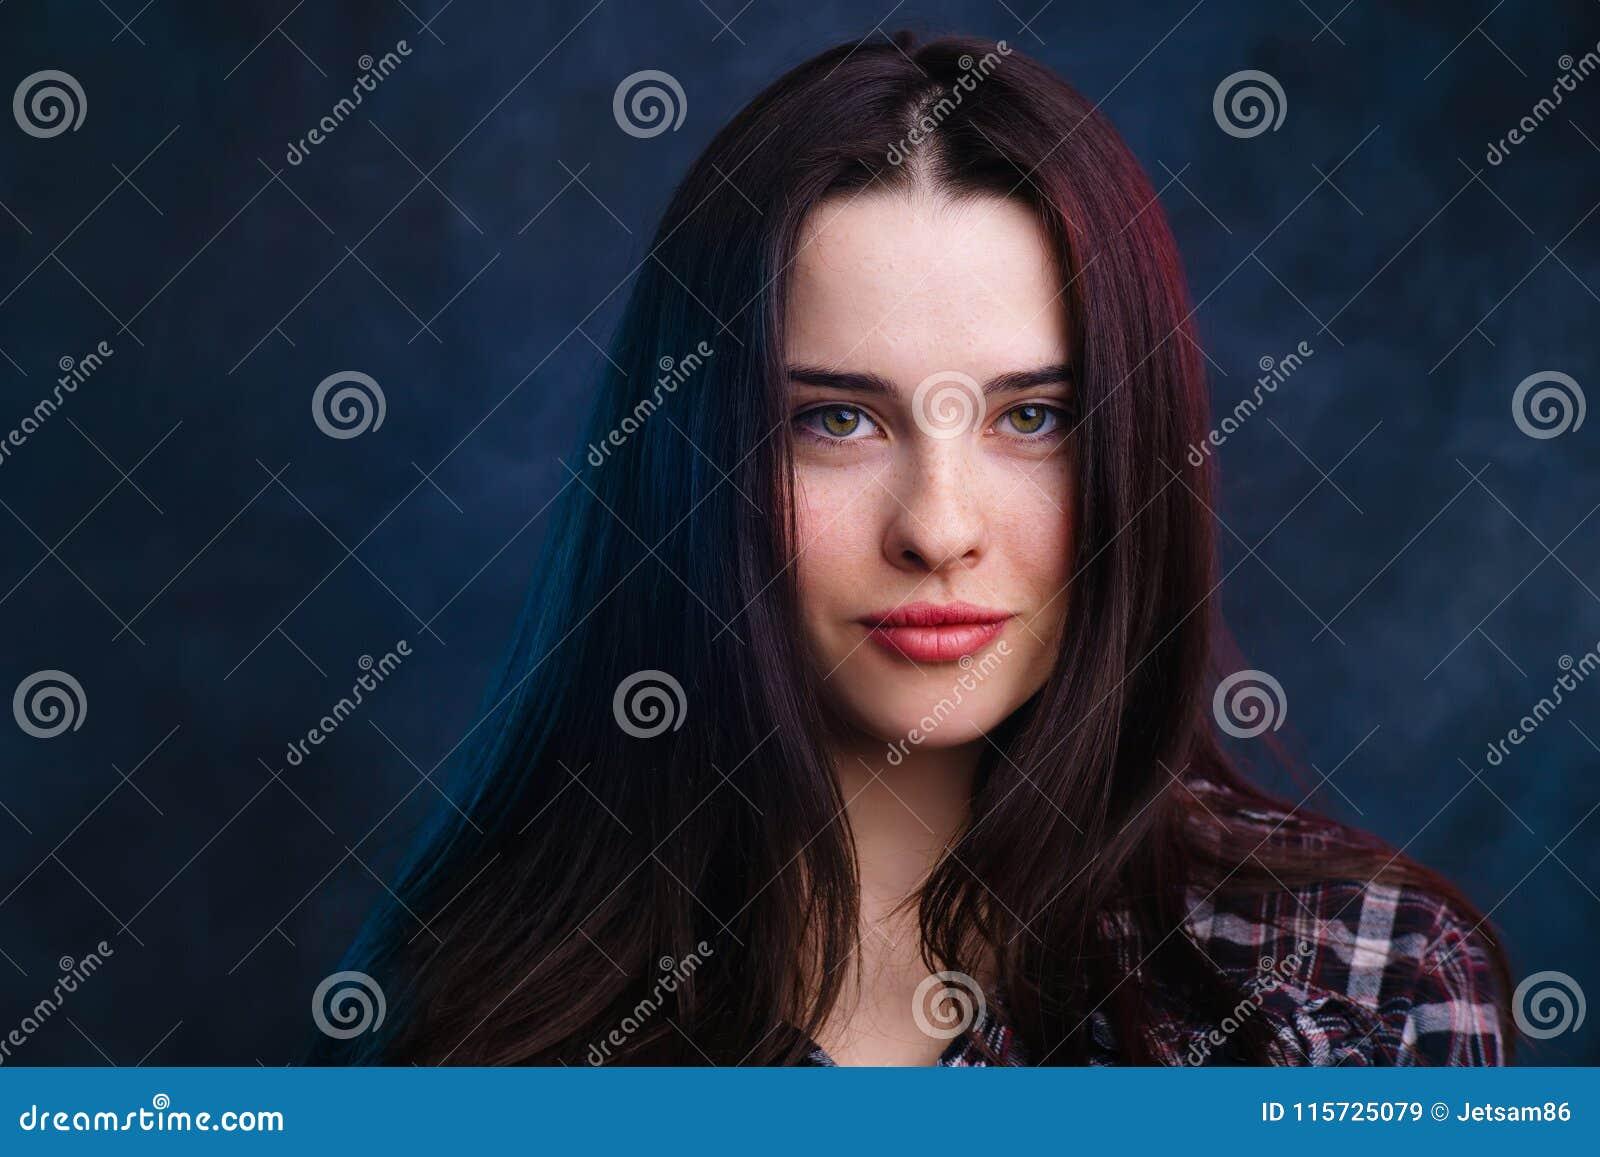 Young Cute Smiling Girl Studio Shoot. Natural Beauty f6280e362